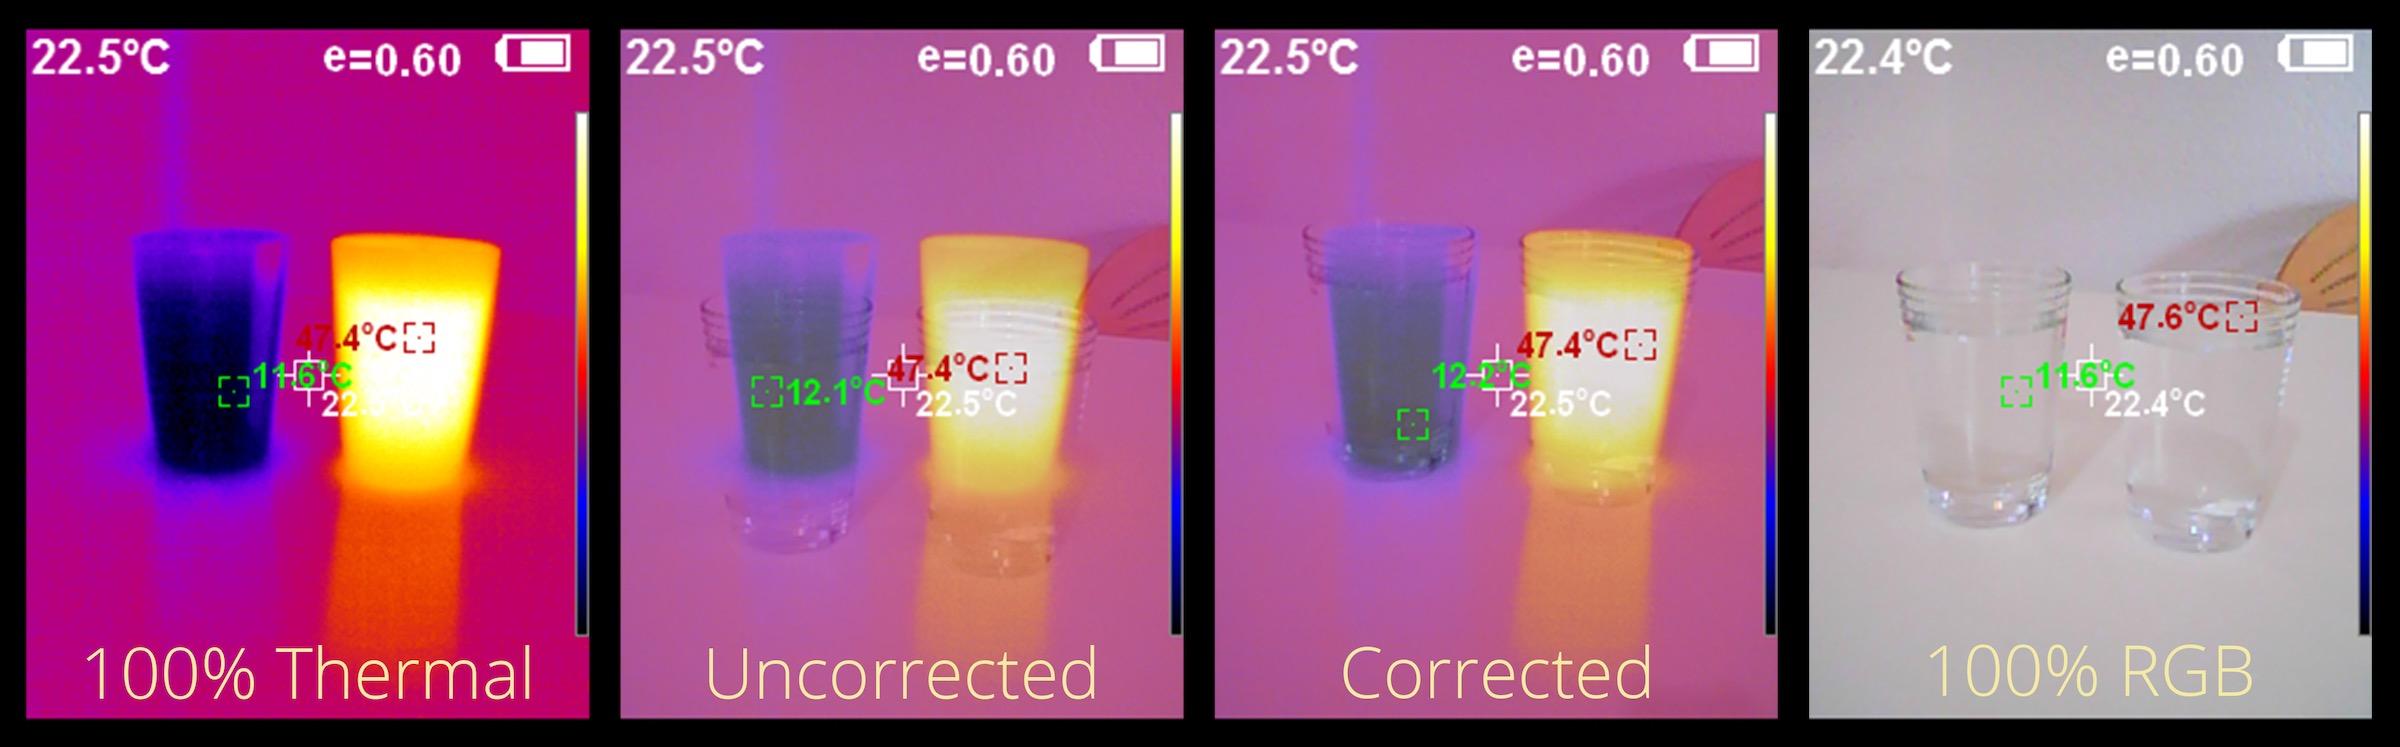 PerfectPrime IR-0019 RGB Image Overlay Positioning